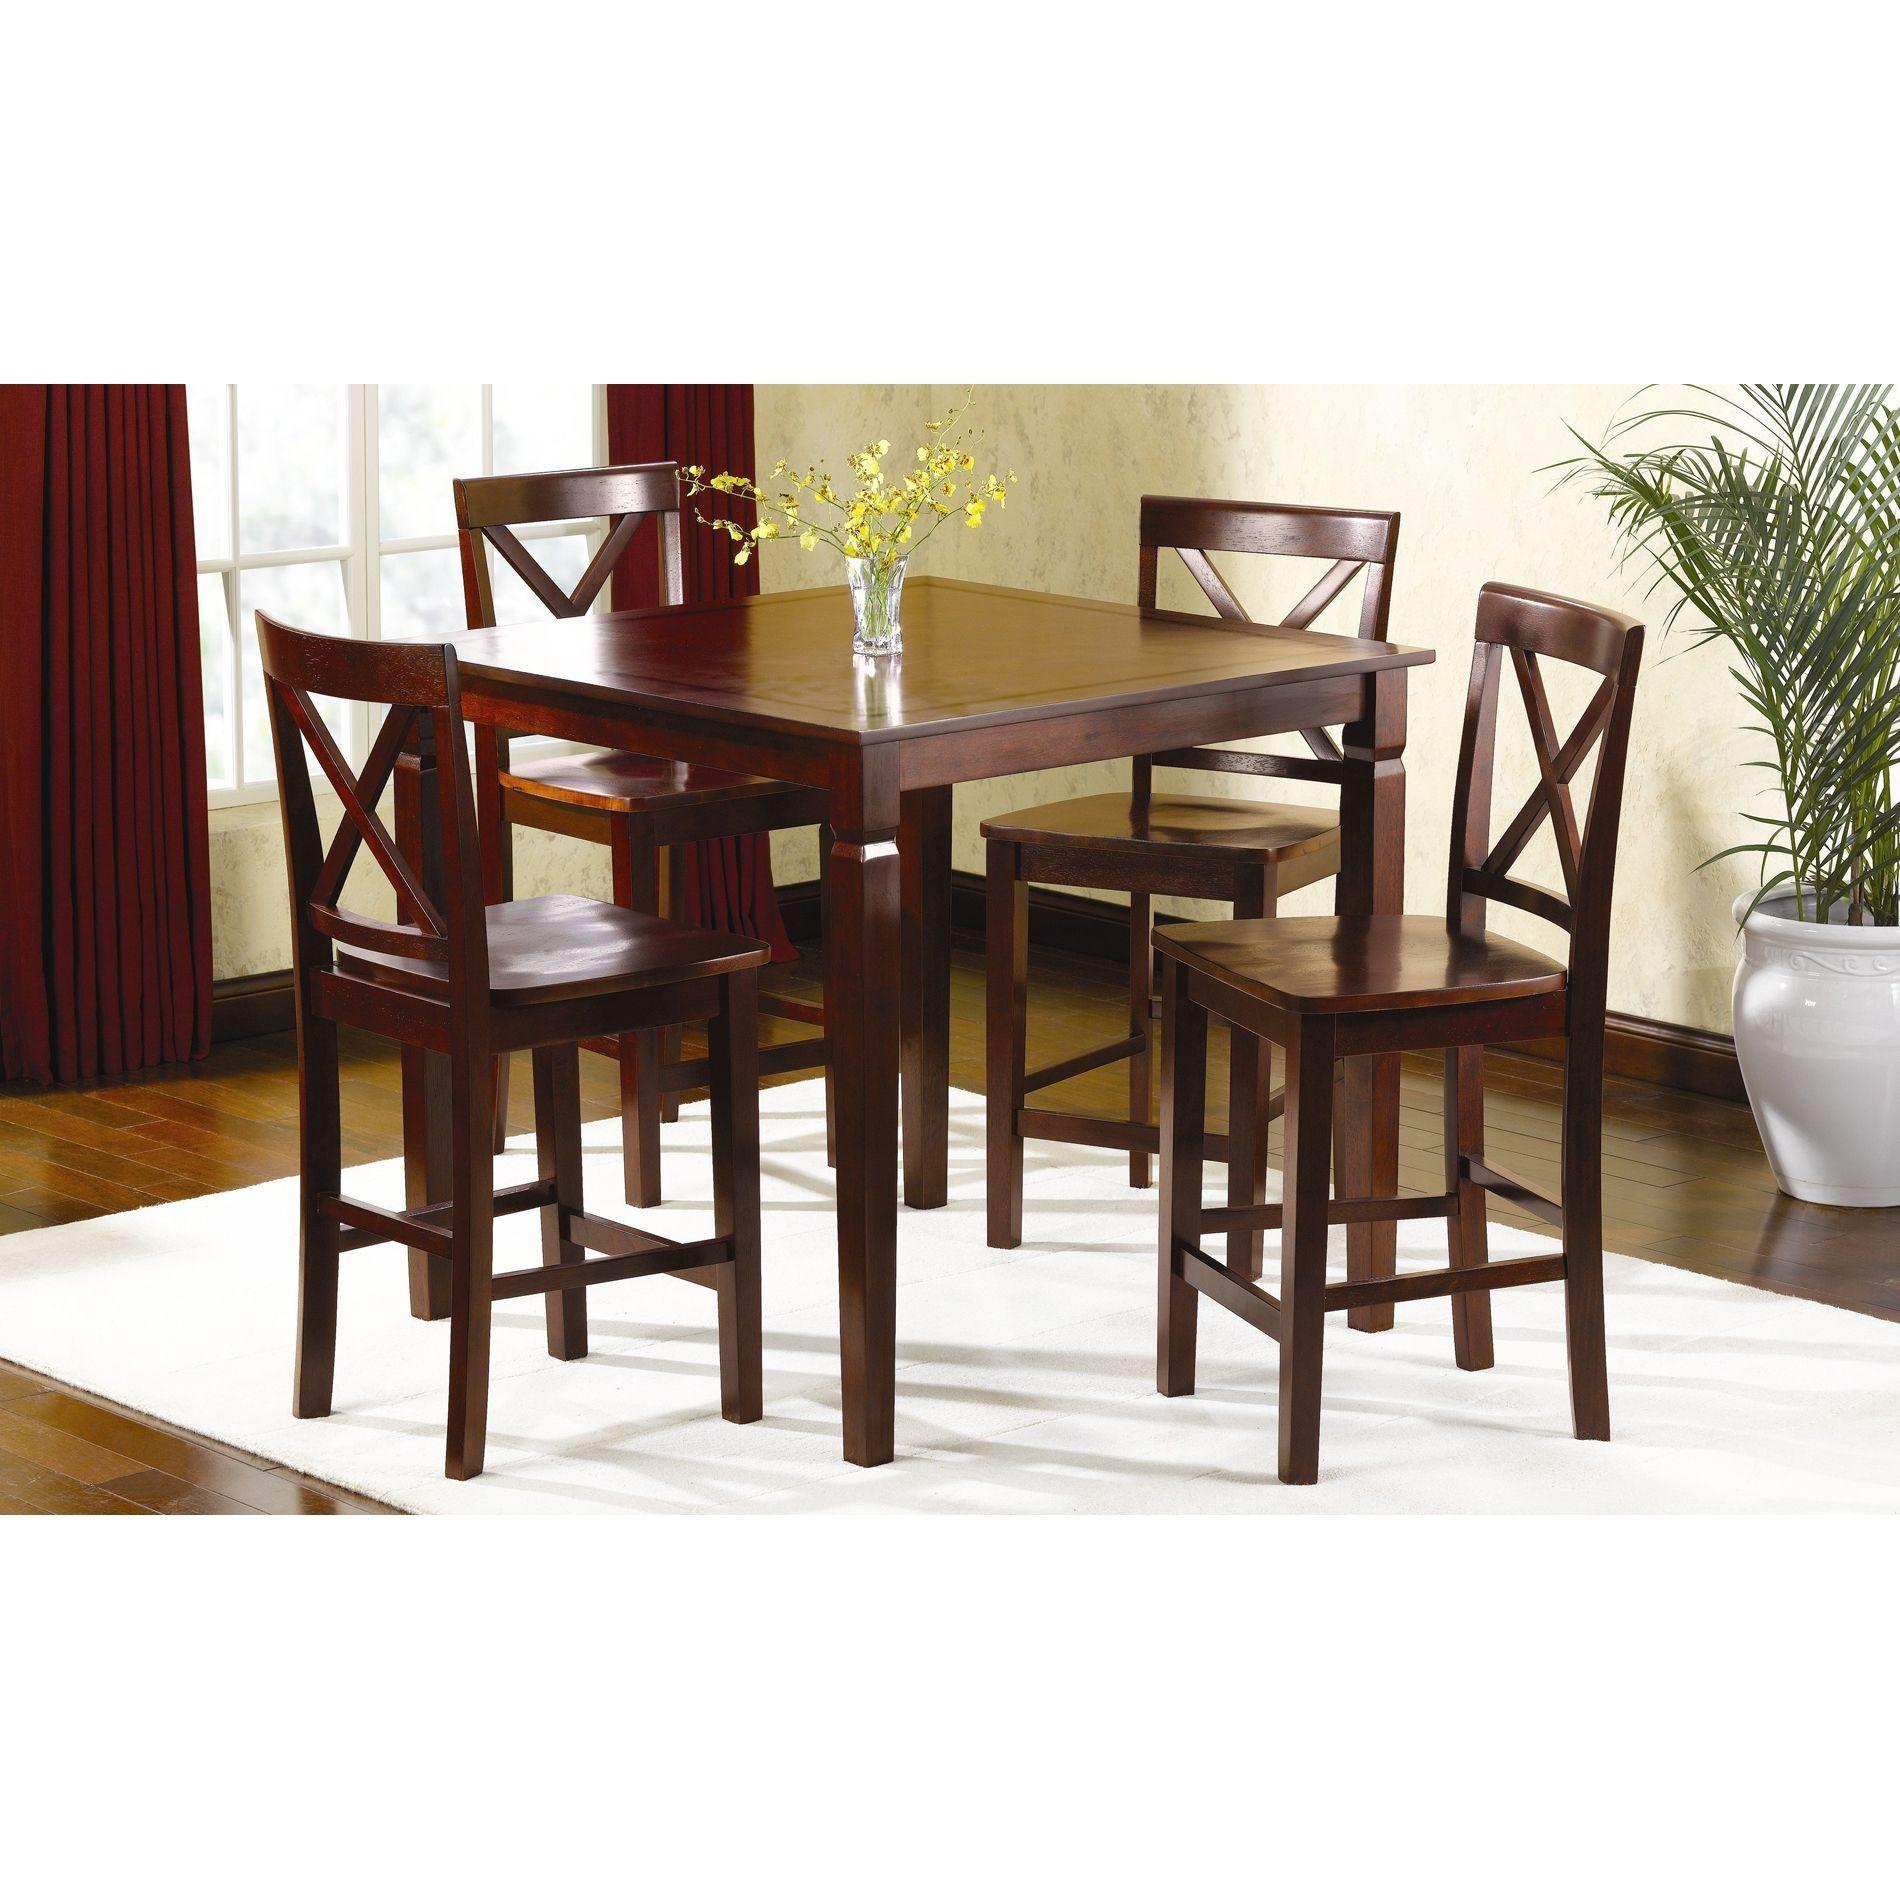 Kmart high kitchen table sets